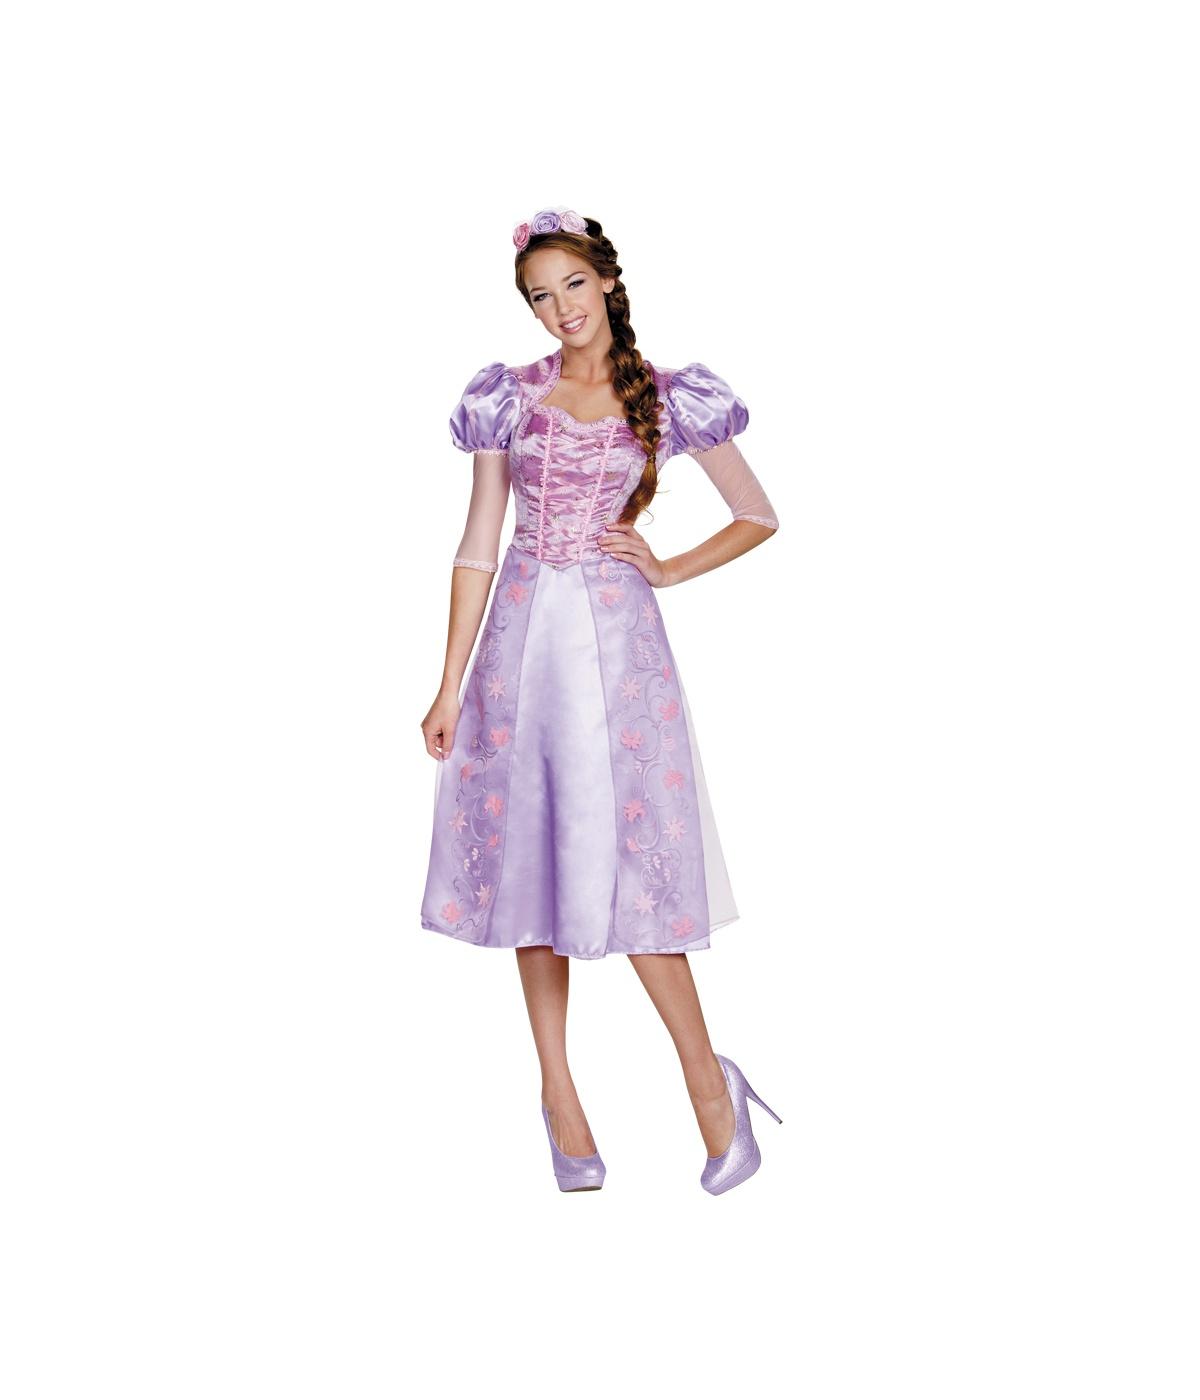 disney princess rapunzel womens dress costume. Black Bedroom Furniture Sets. Home Design Ideas